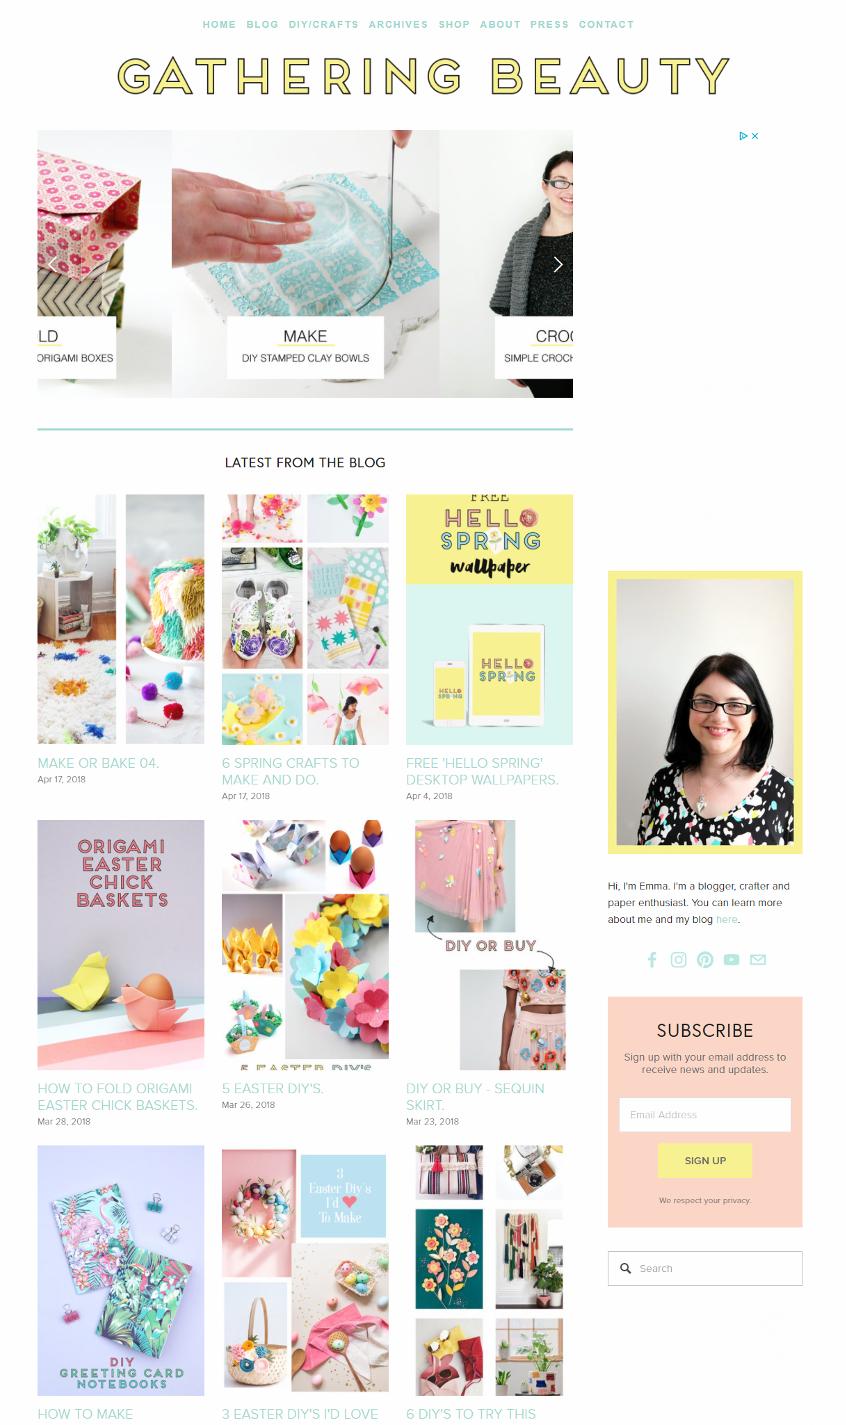 gathering-beauty-blog-website-update.jpg